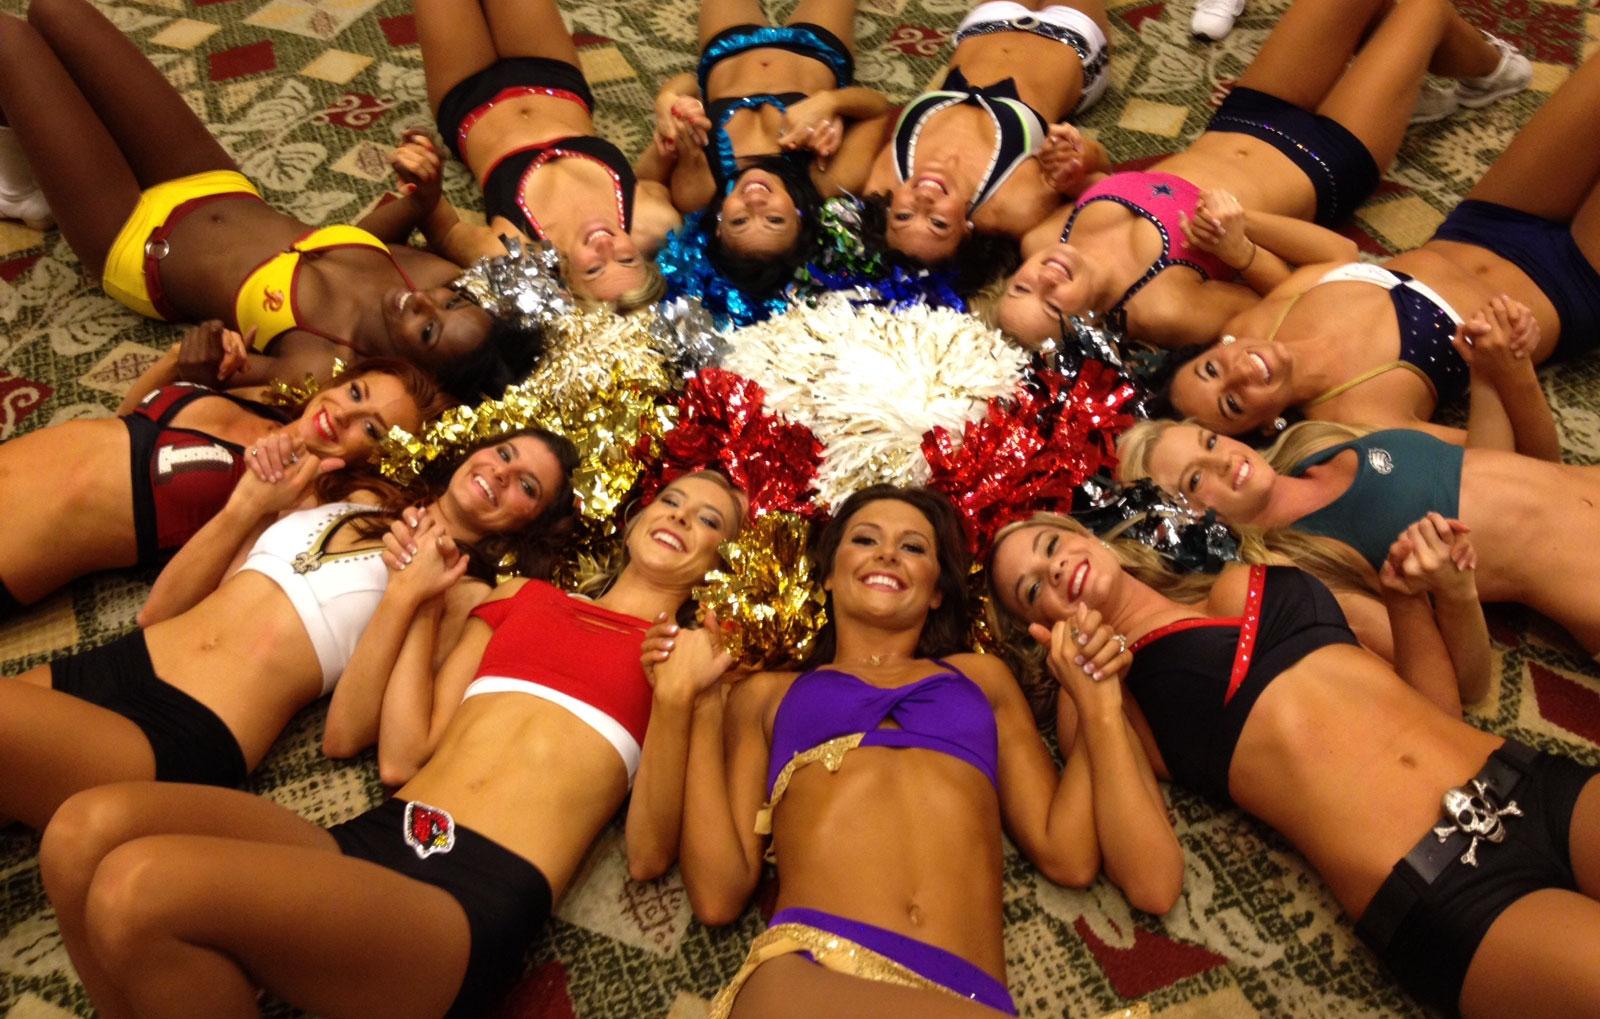 nfl players dating nfl cheerleaders